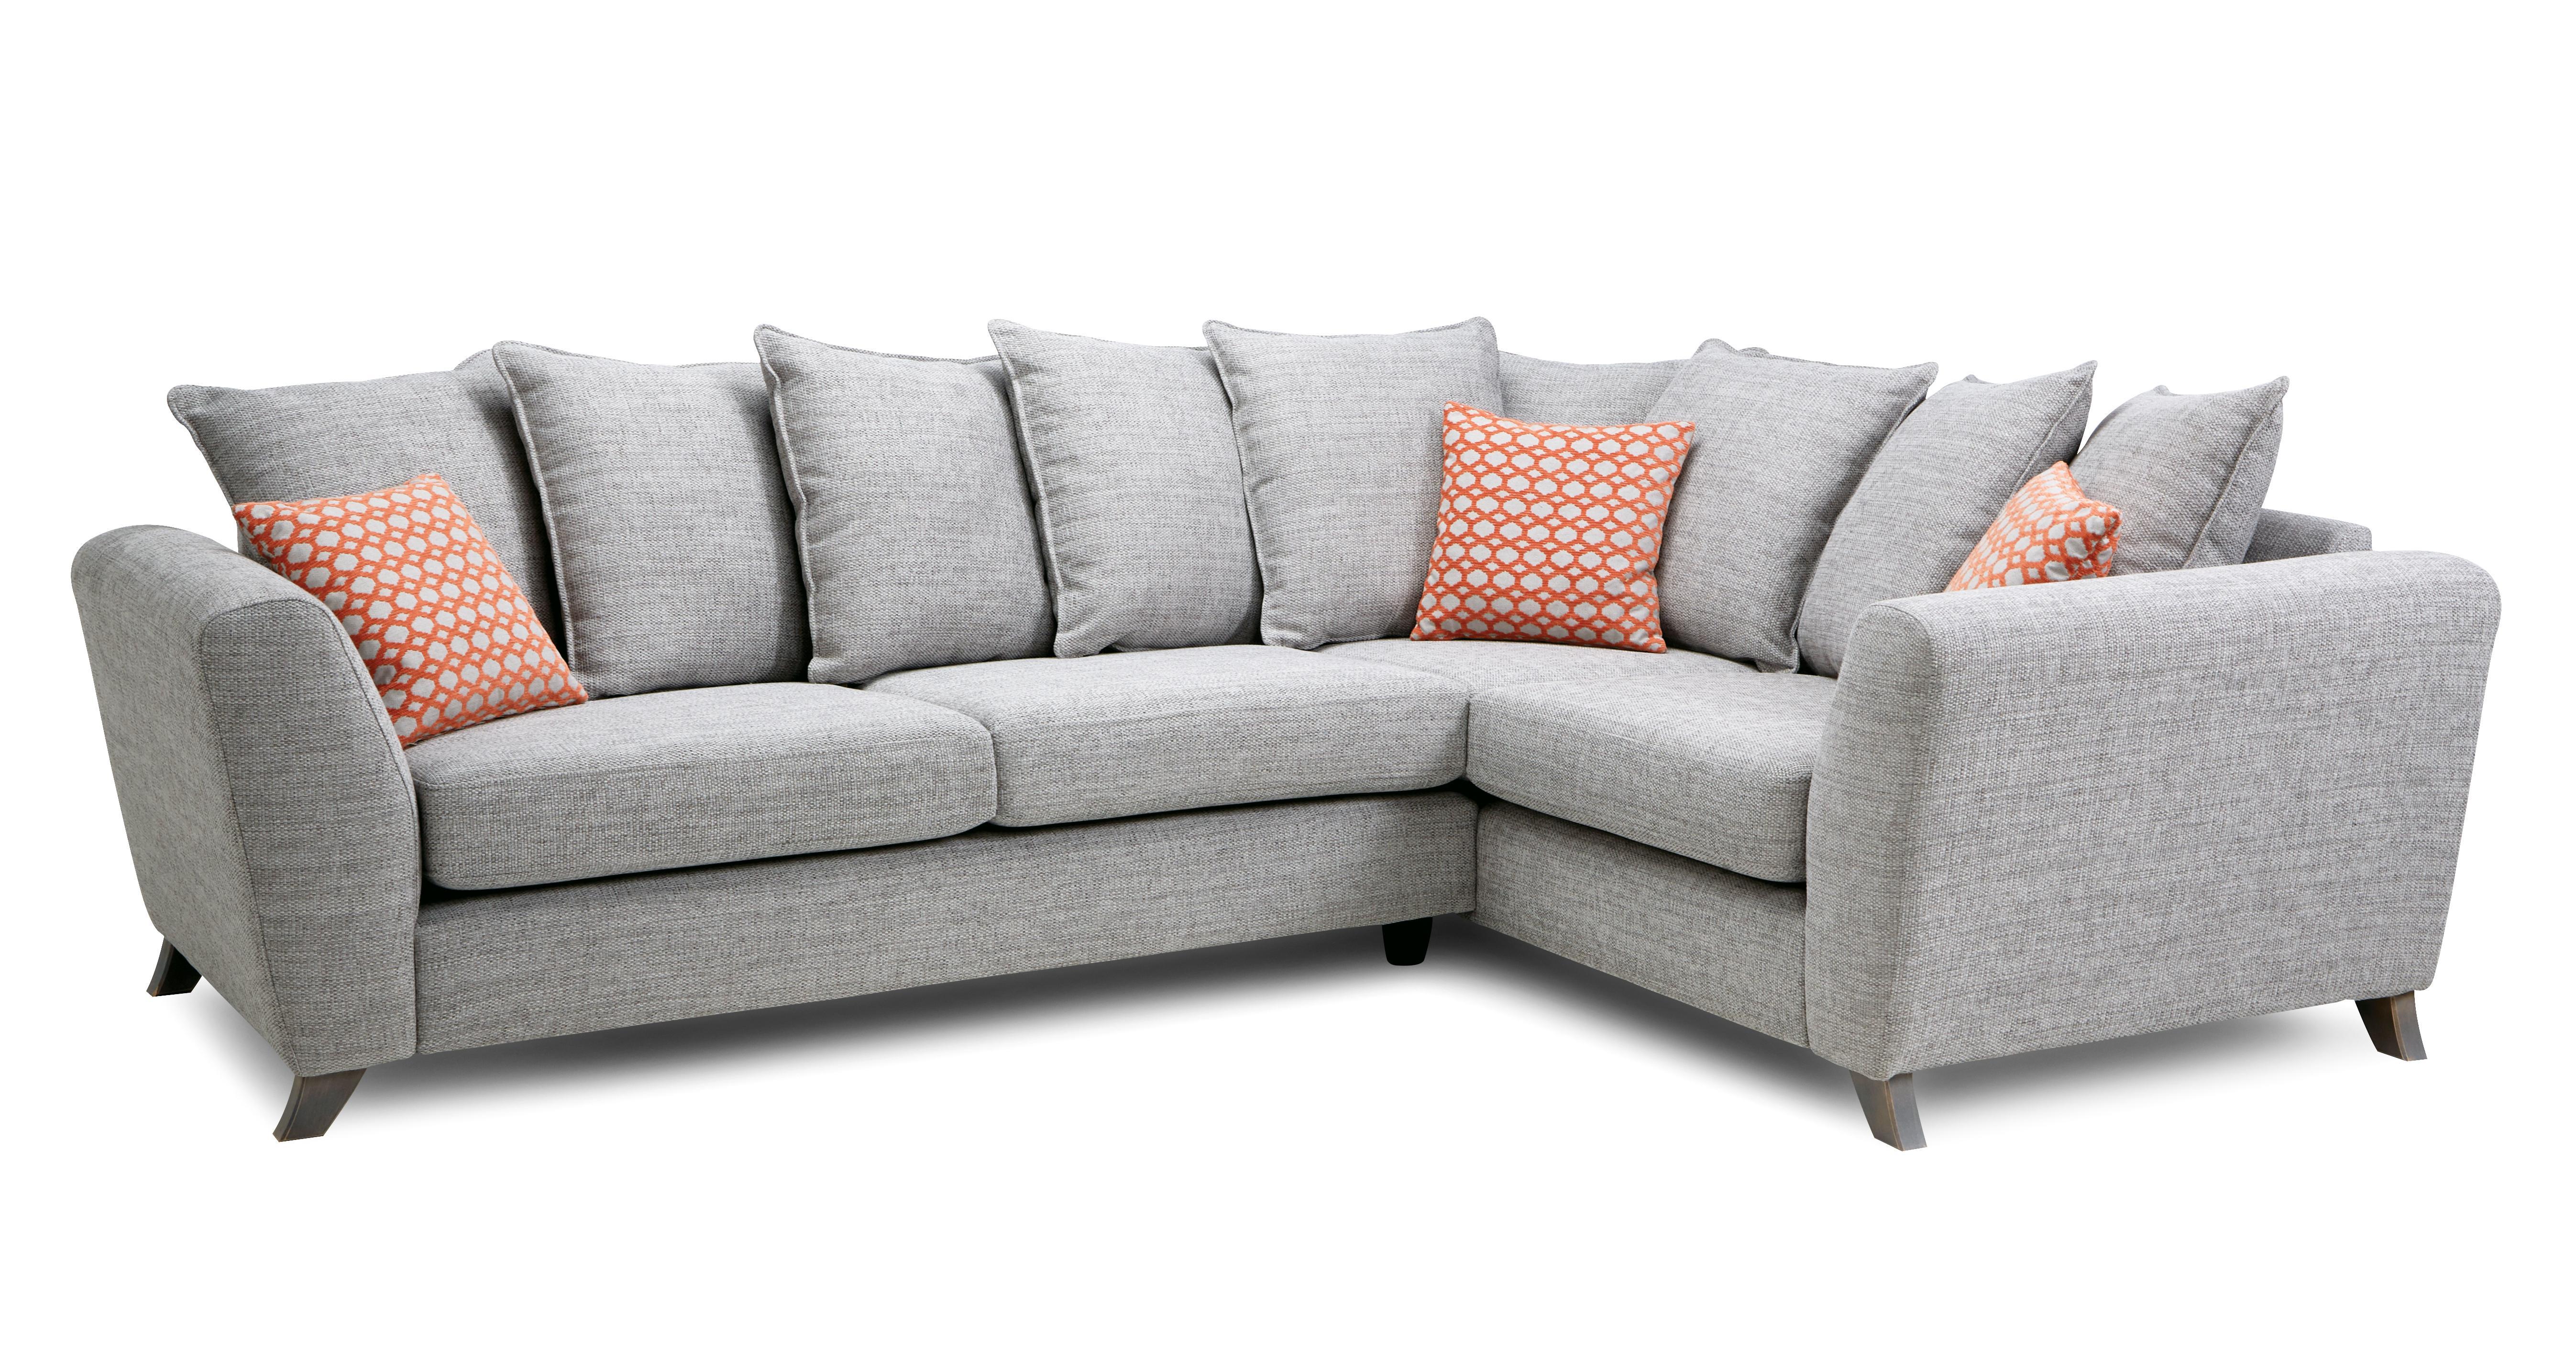 Welbury Pillow Back Left Hand Facing 3 Seater Corner Sofa ...